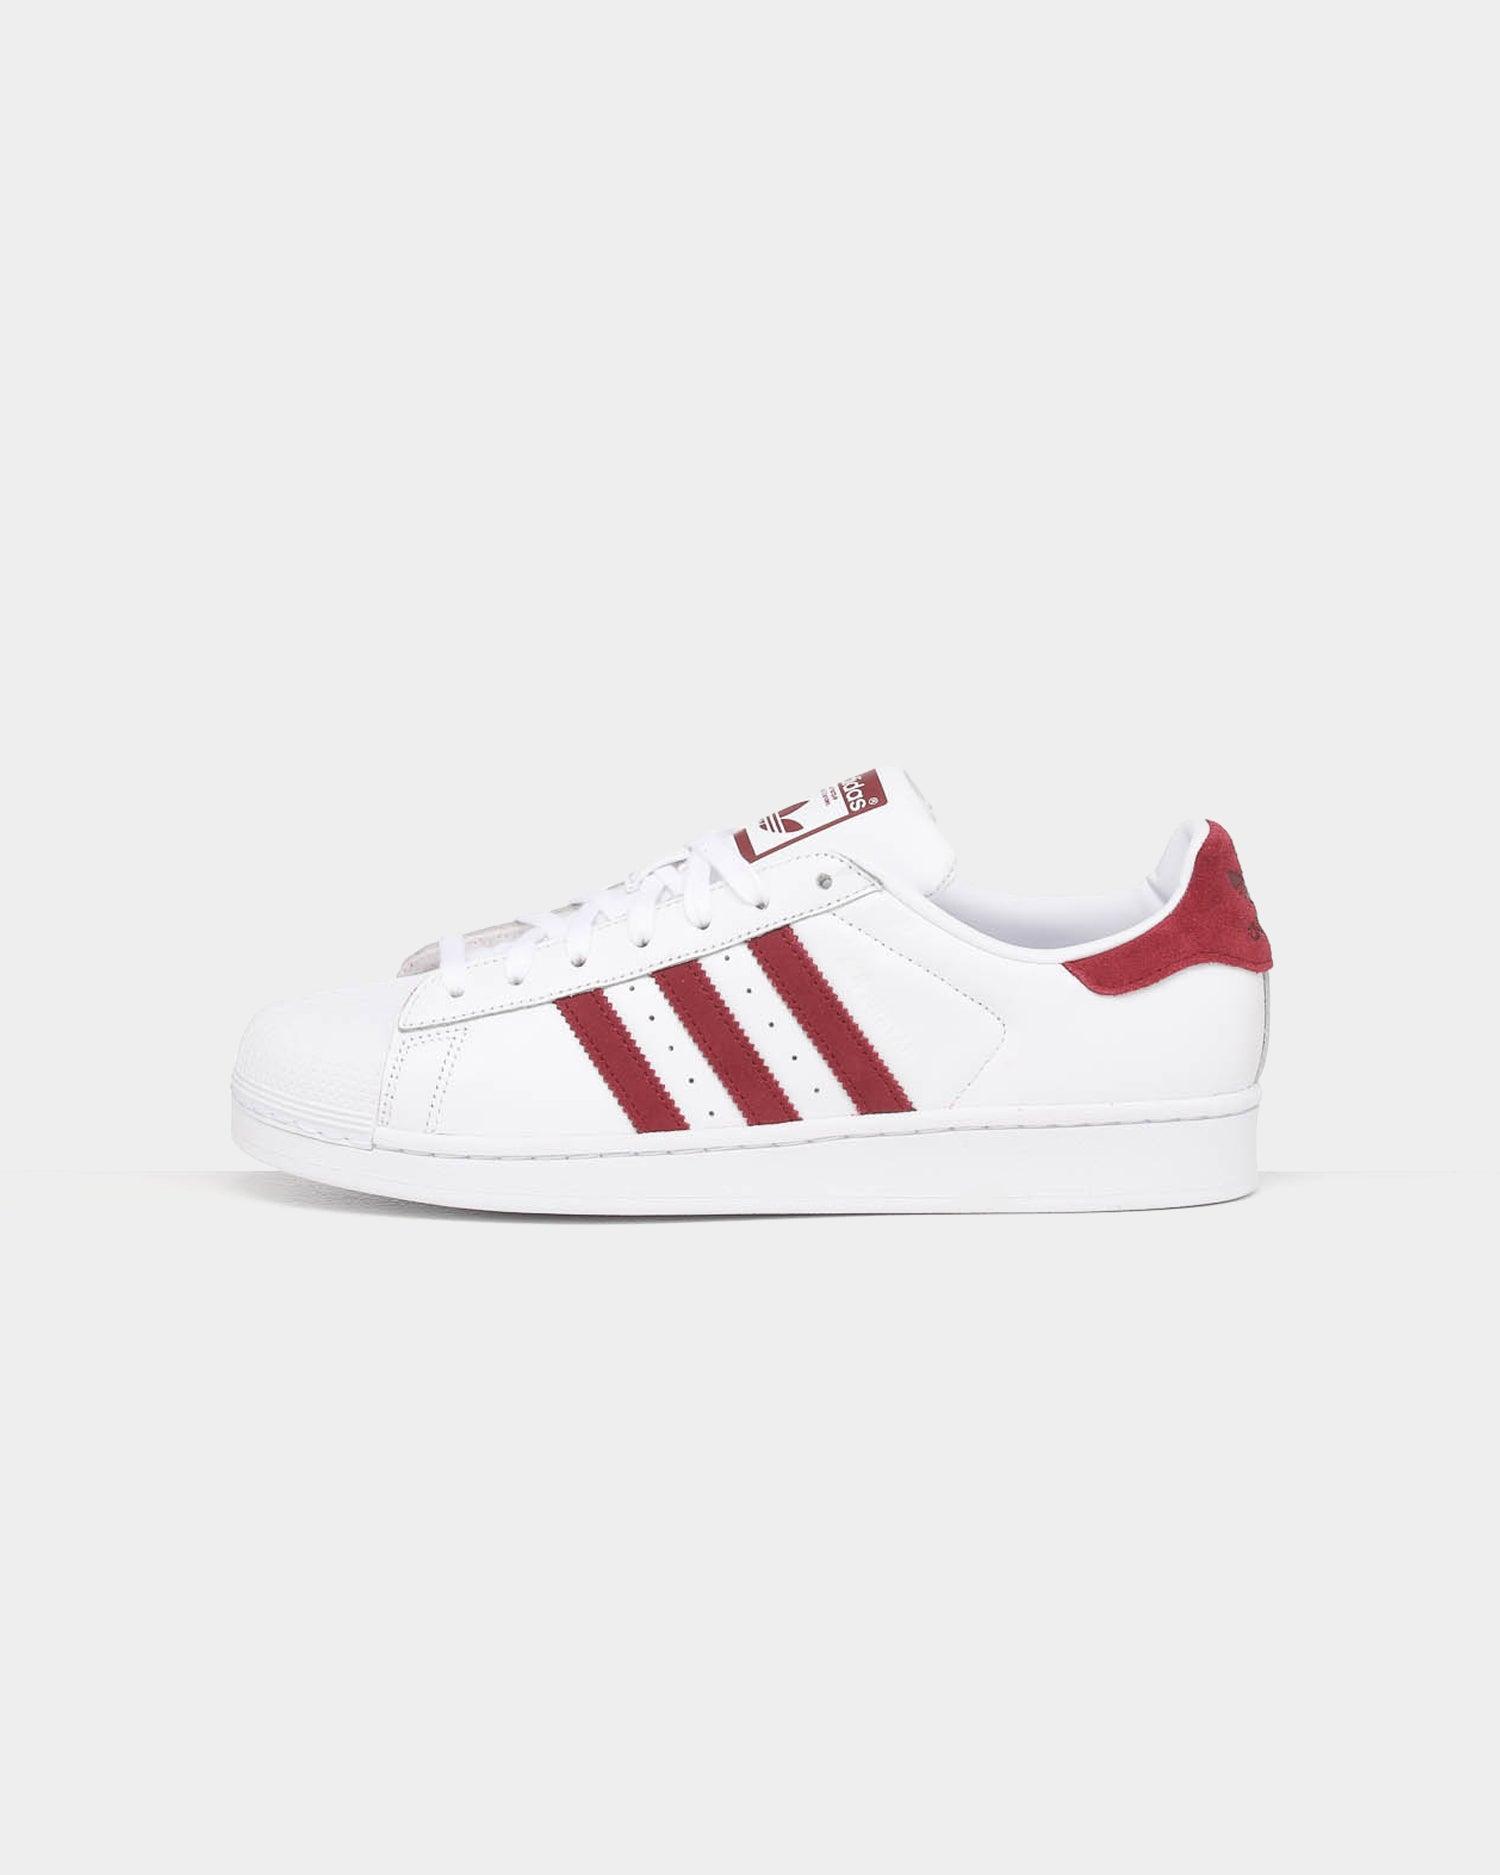 Adidas Superstar WhiteBurgundy